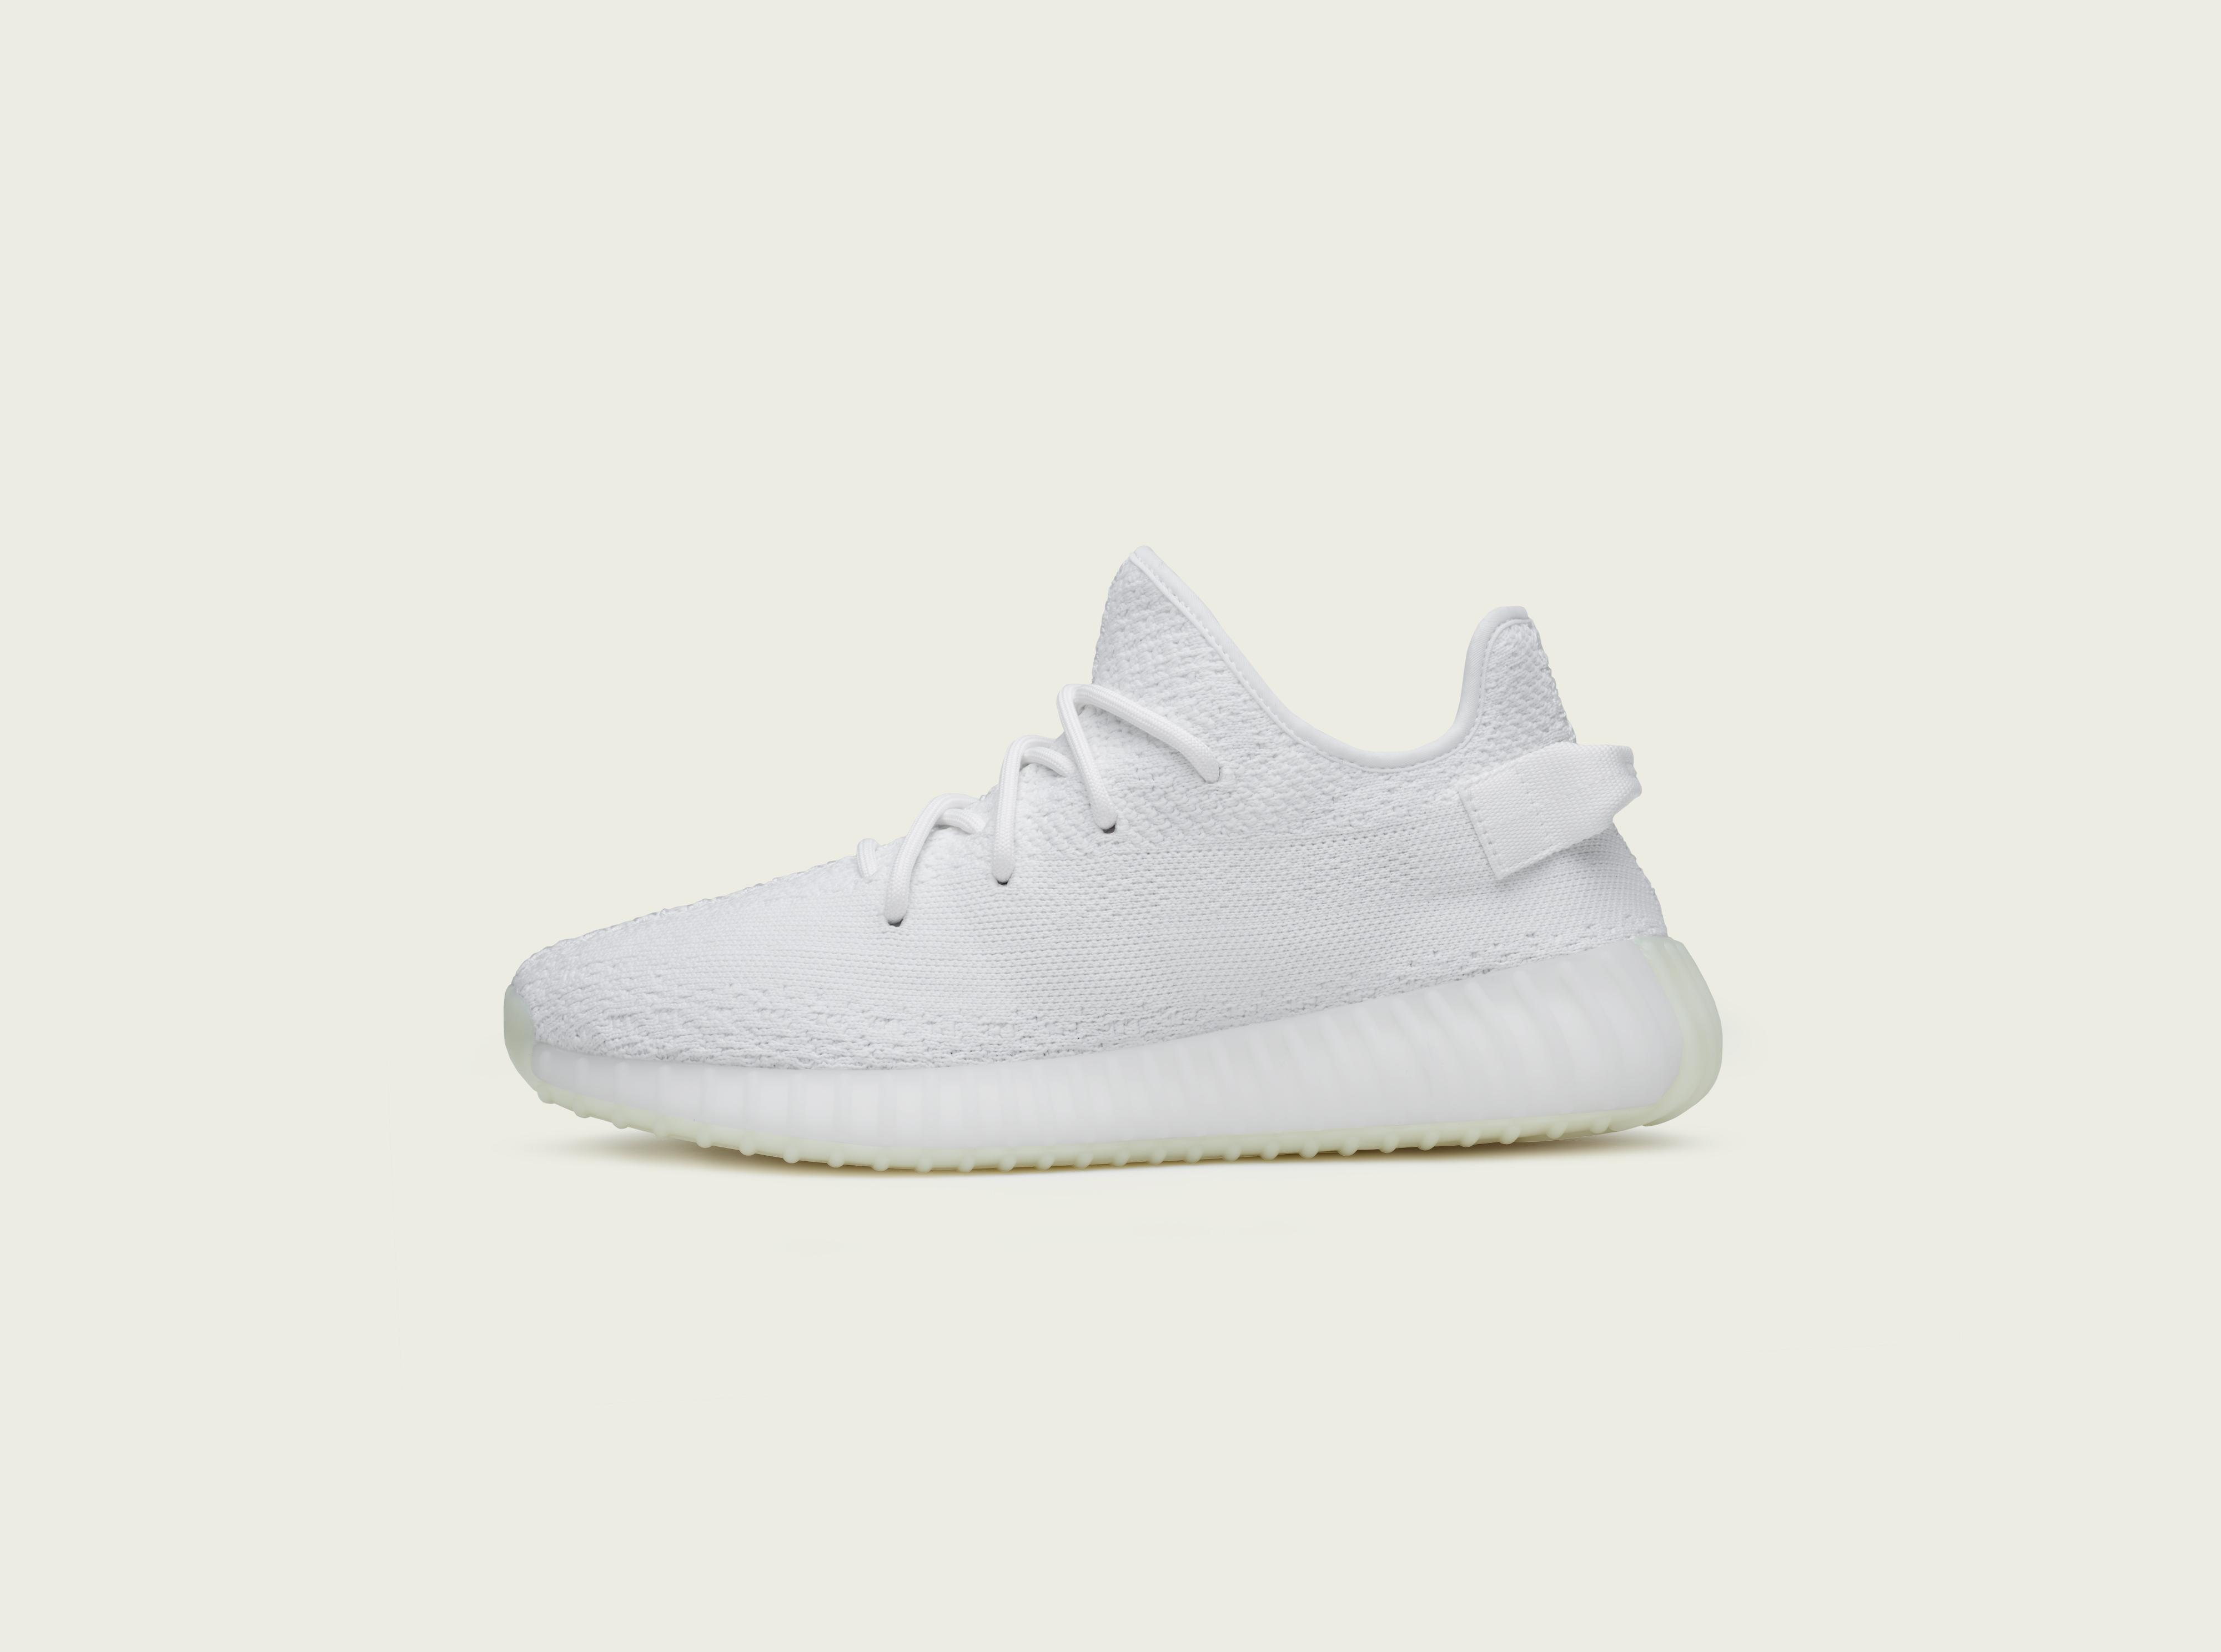 Adidas Yeezy Boost 350 V2 Kanye West